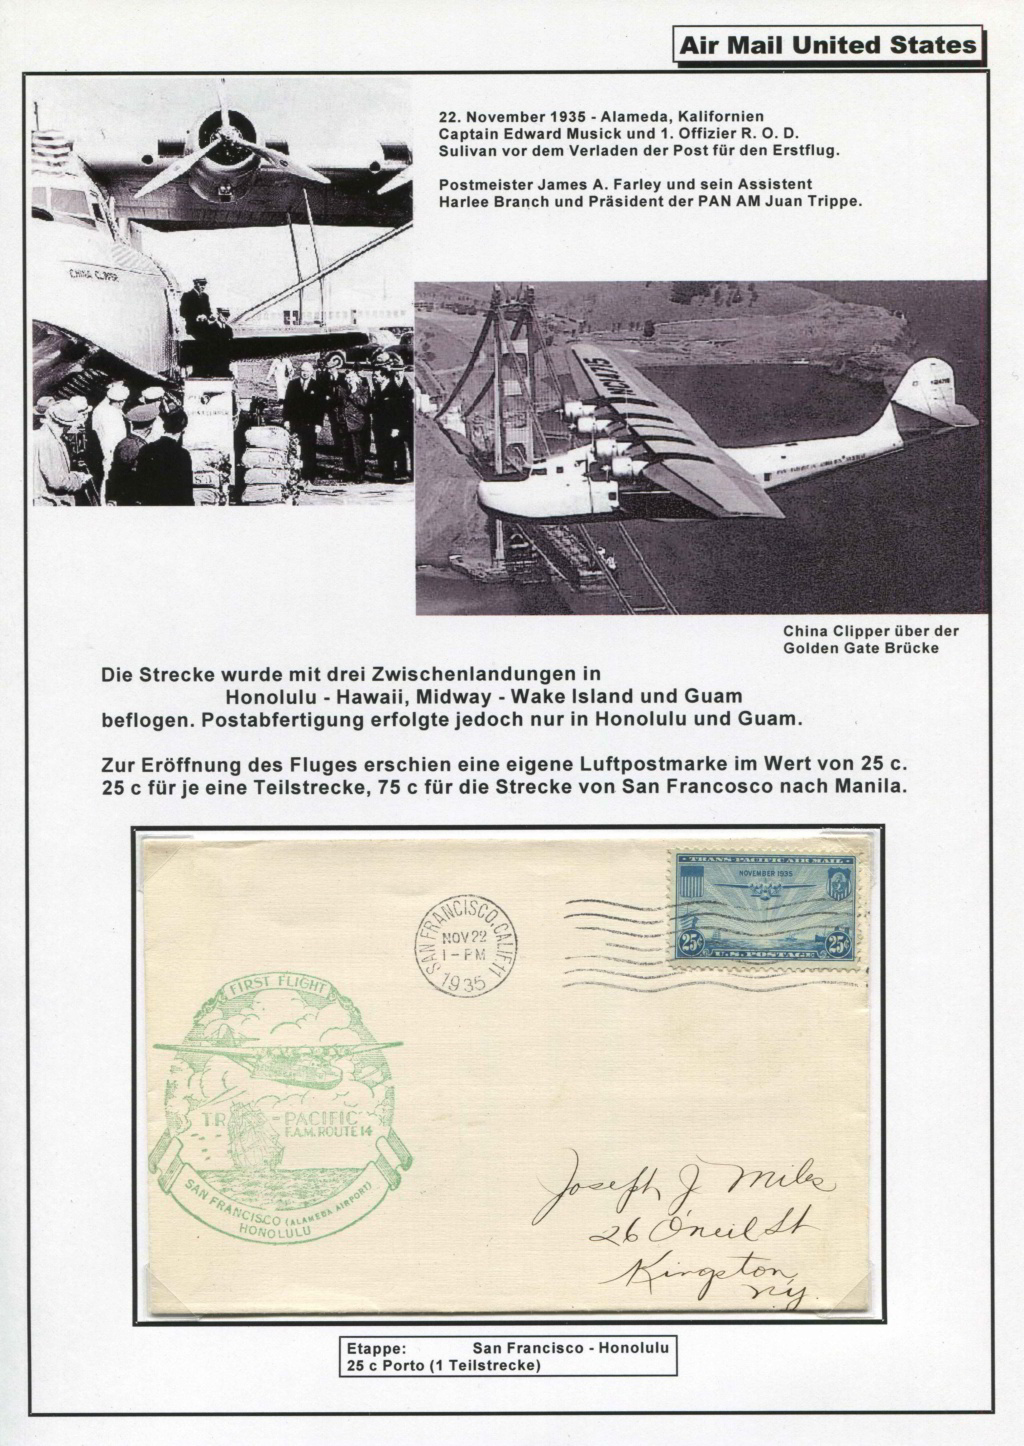 Sammlung FAM 14 (FOREIGN AIR MAIL ROUTE No 14) - Teil 1 Fam_1425